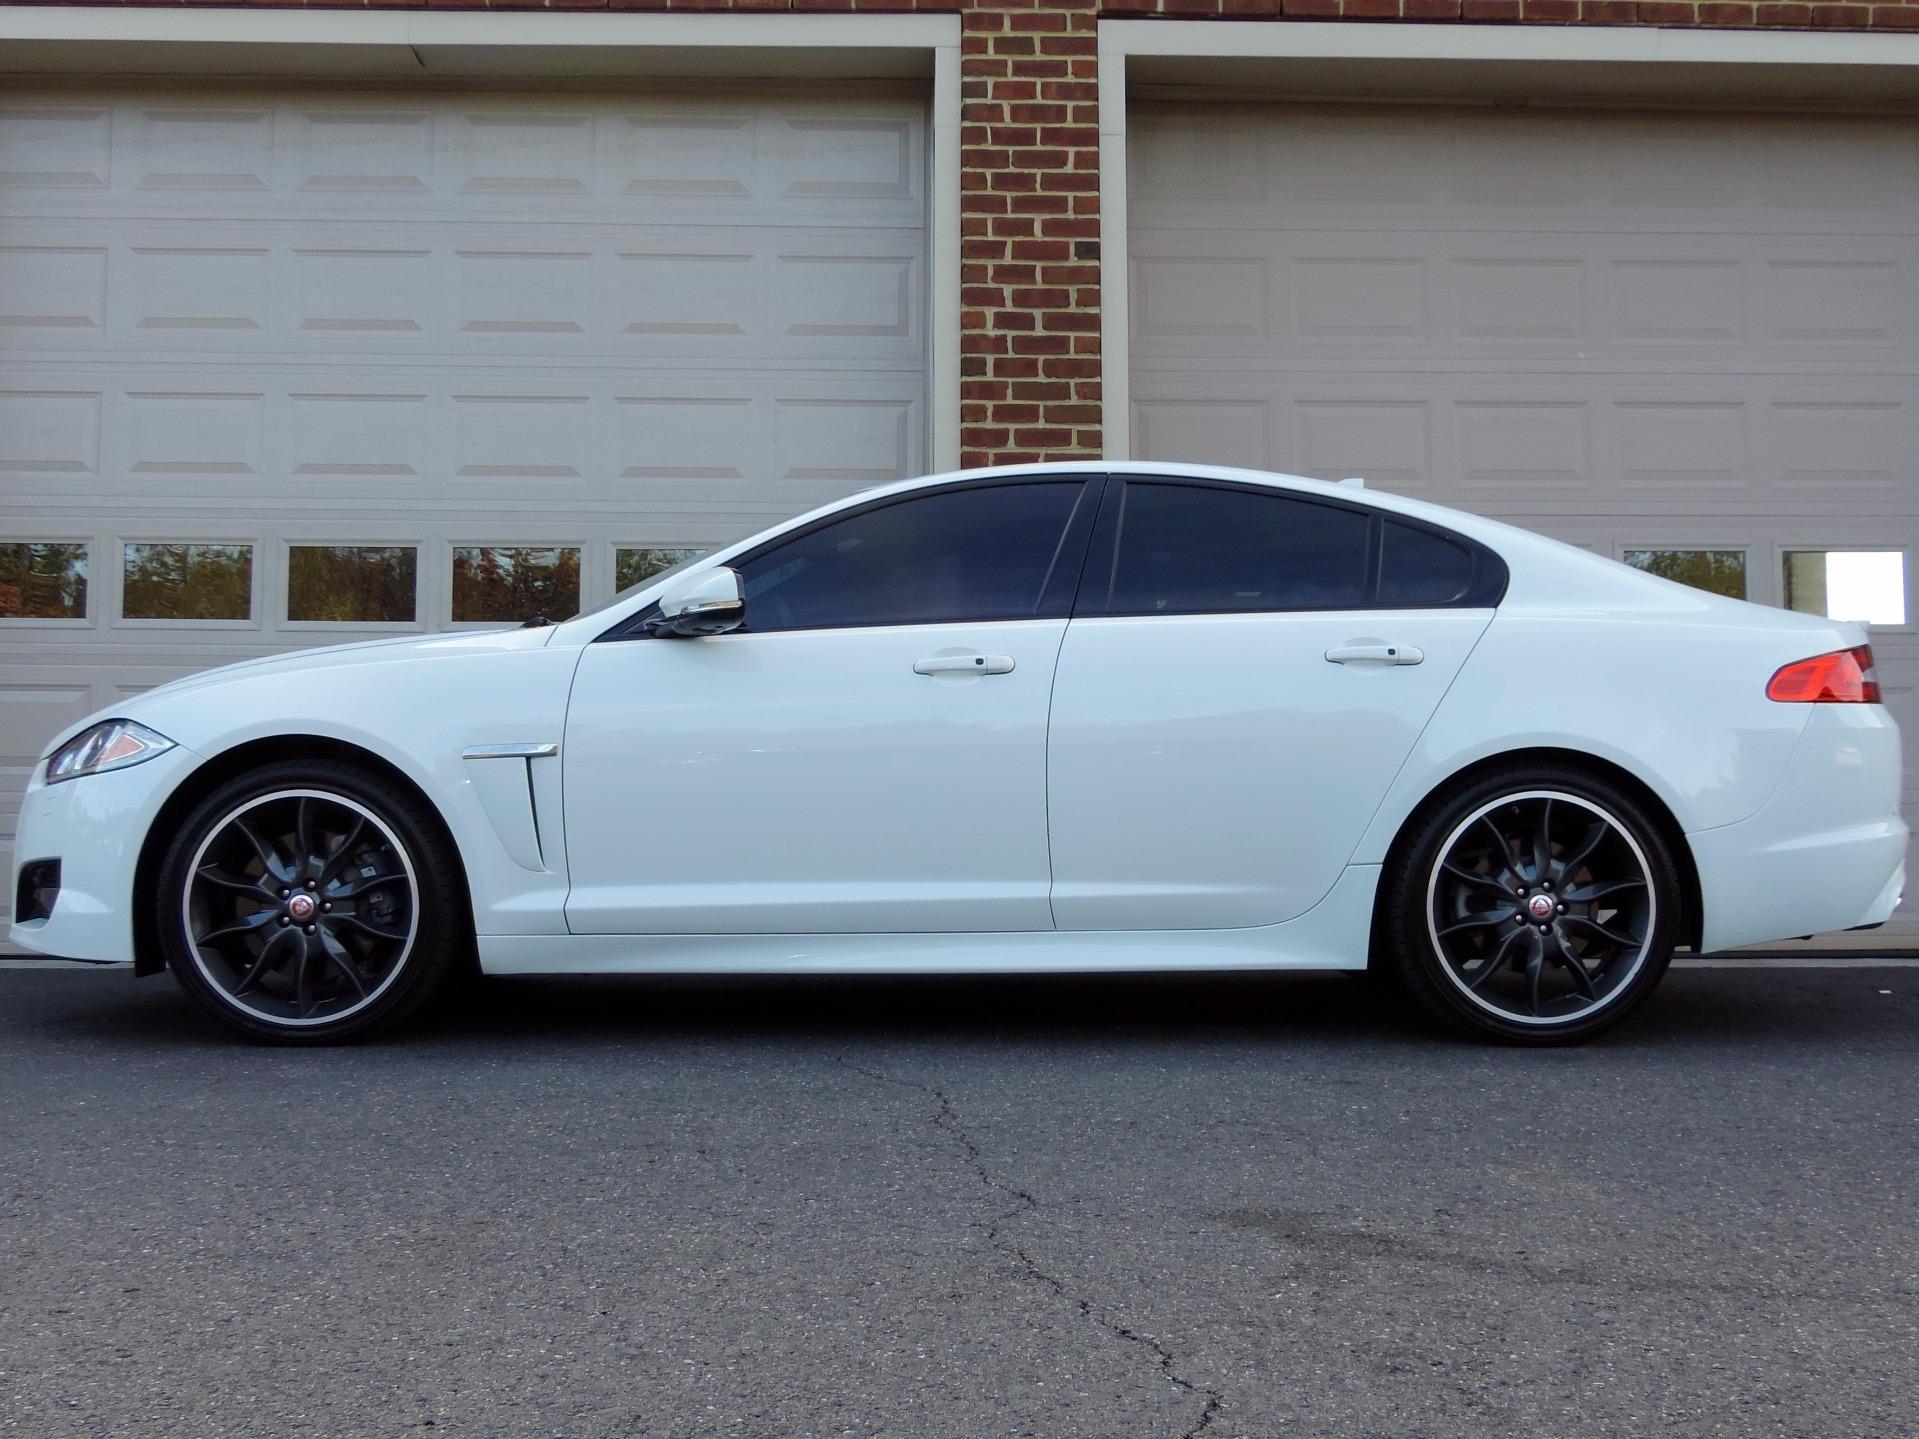 f cars xj com news issue jaguar transmission type jpeg articles xf